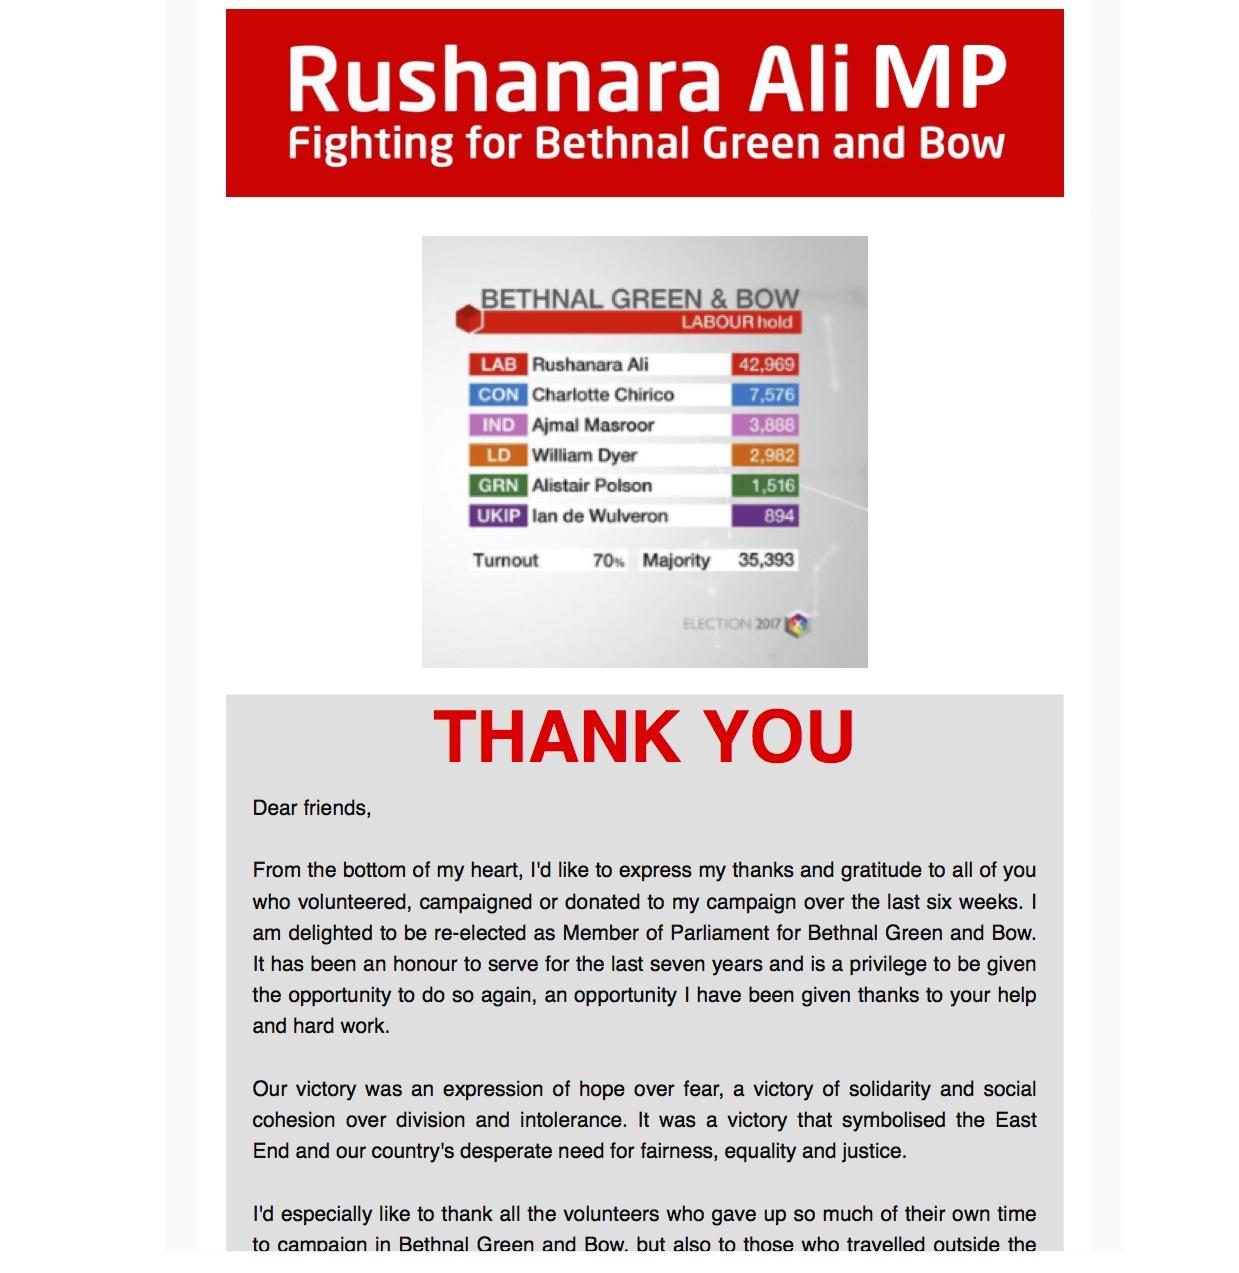 Rushanara_Thank_You_Mailout1.jpg